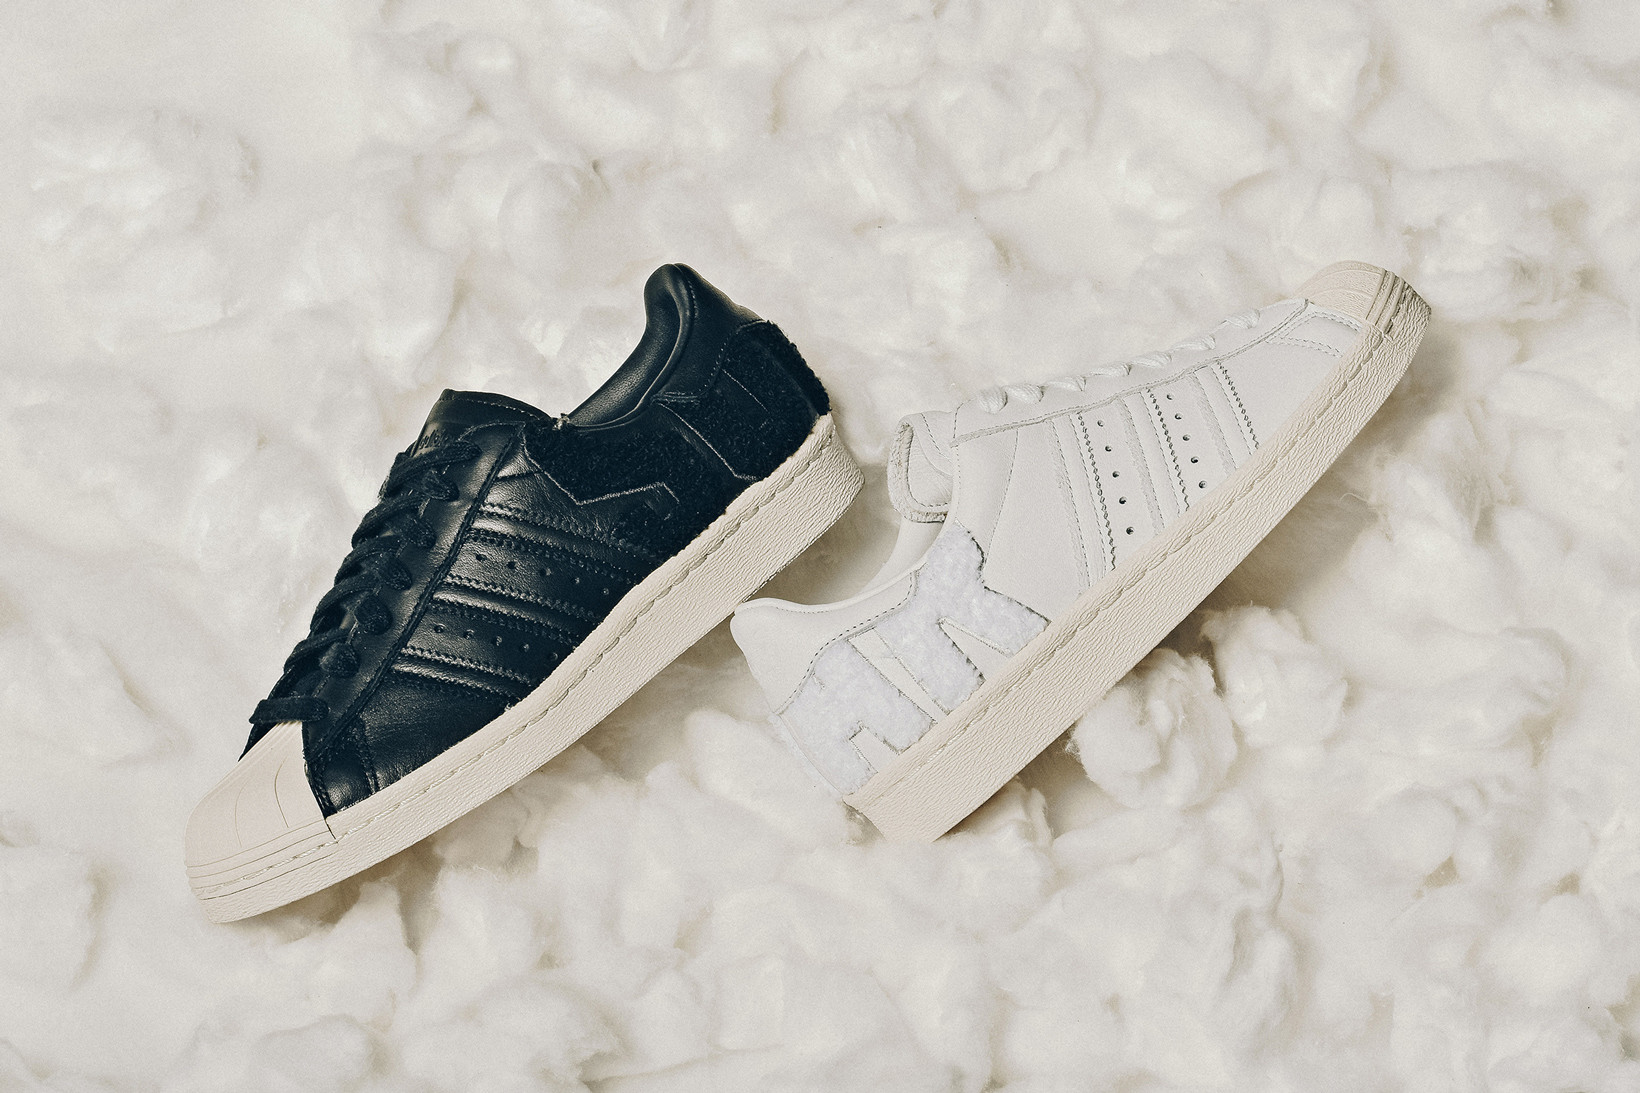 adidas' Superstar 80s \'Varsity Letters\'